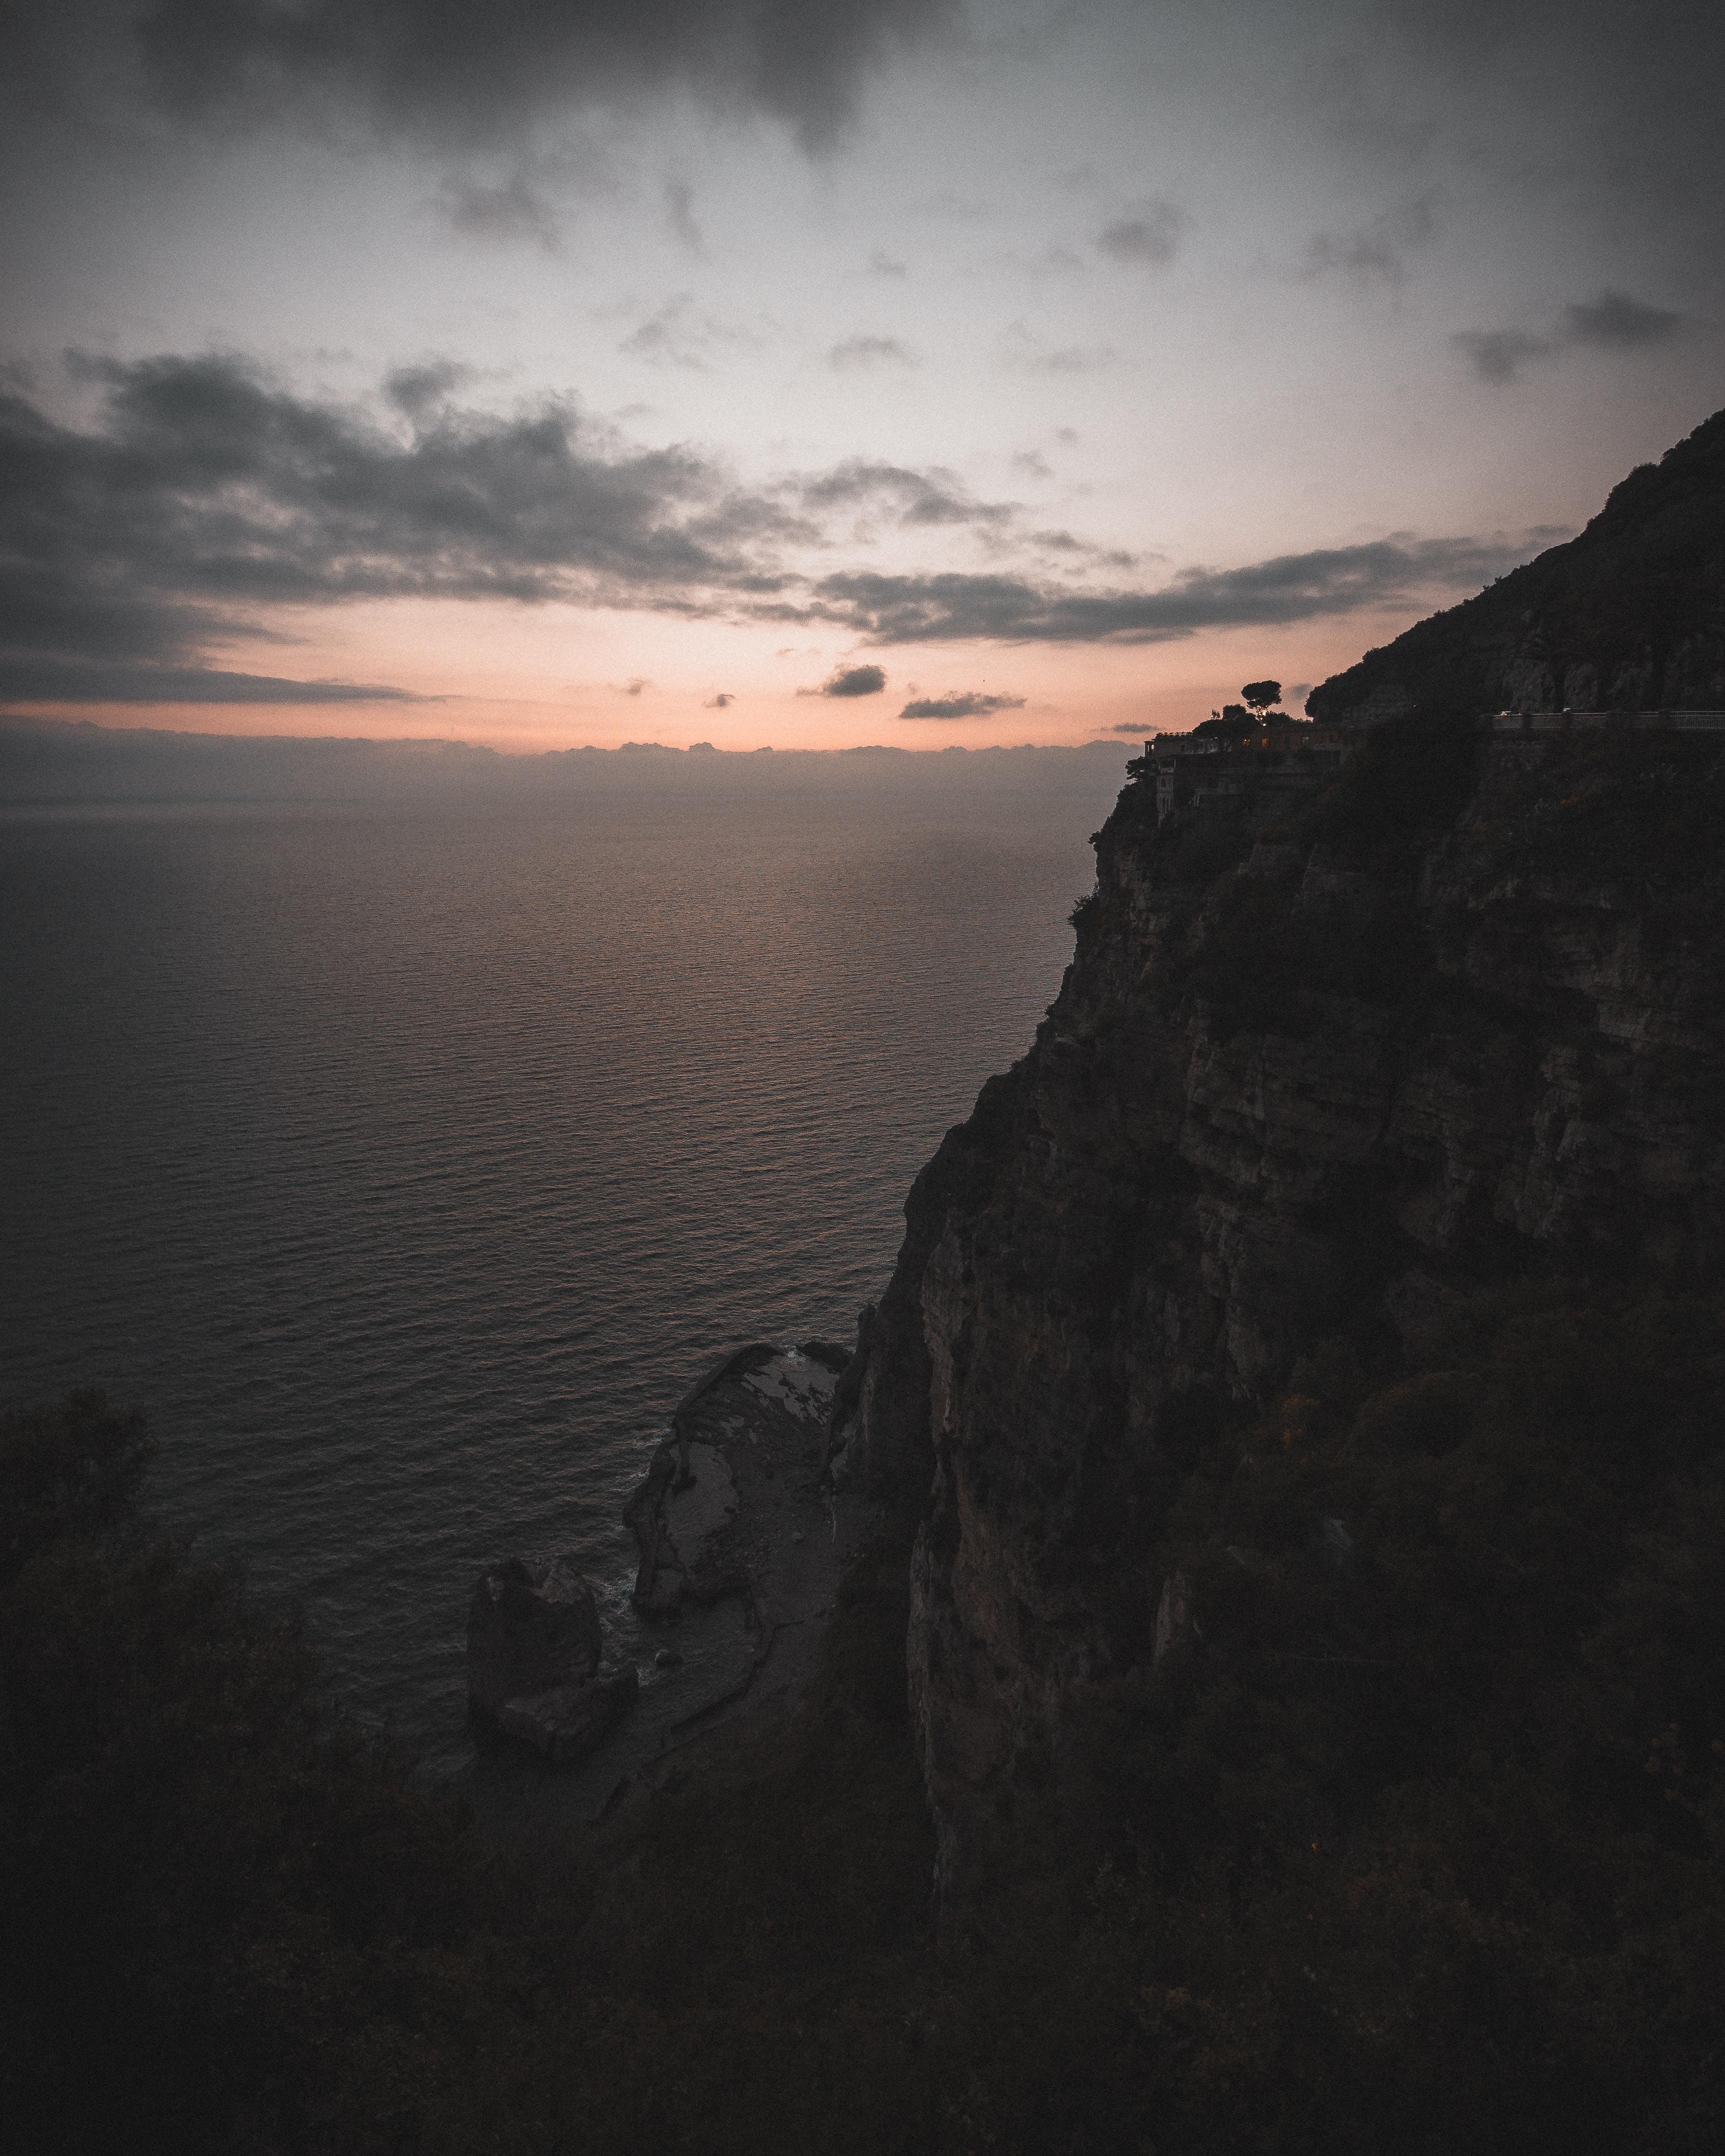 islet rock